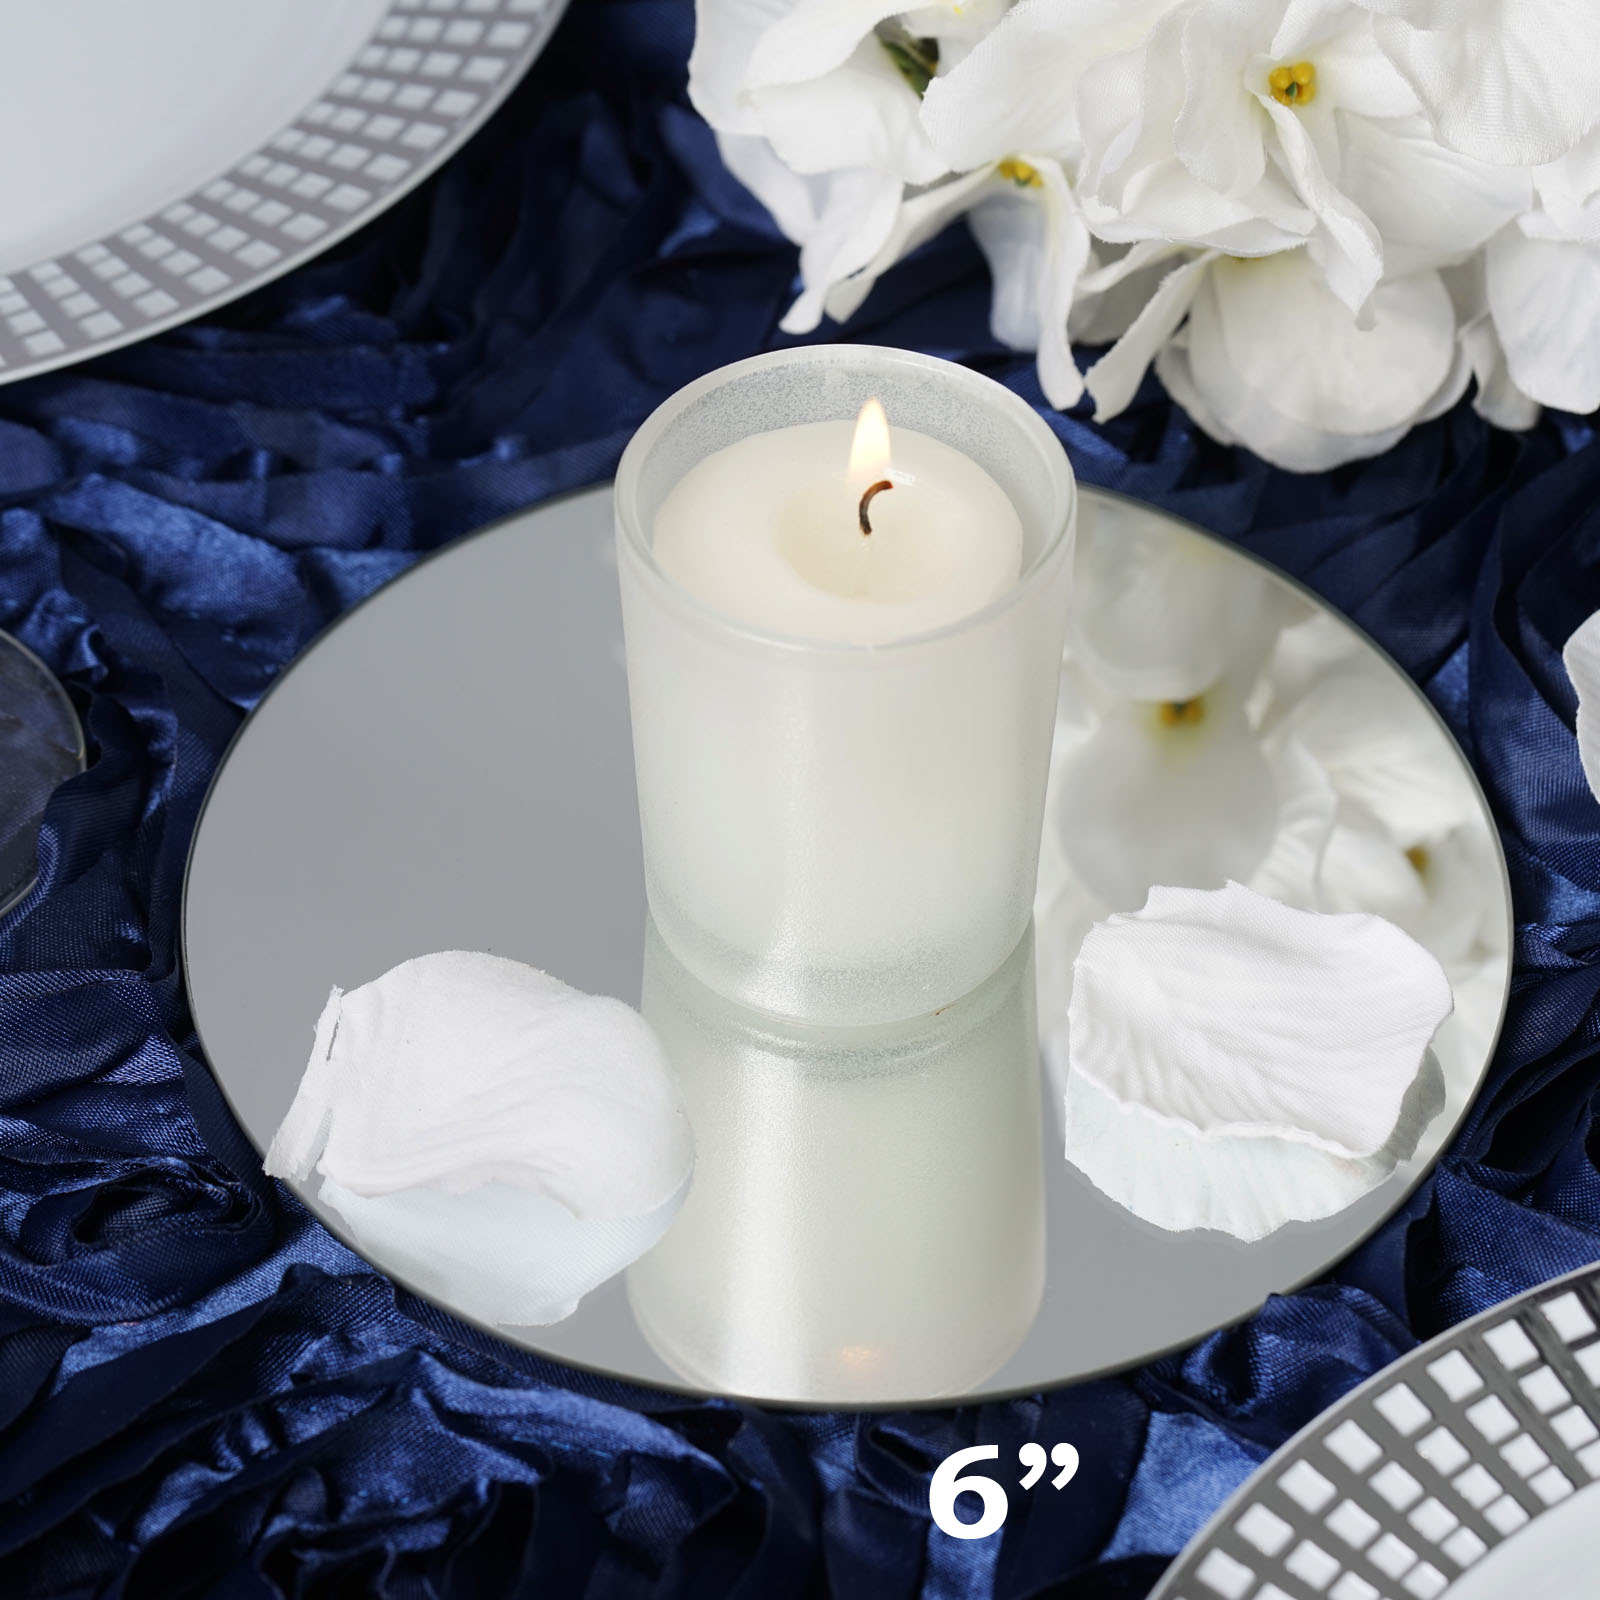 "BalsaCircle 6 pcs x Round 6"" Glass Mirror Wedding Table Decorations - Wedding Party Favors Centerpieces Wholesale Supplies"